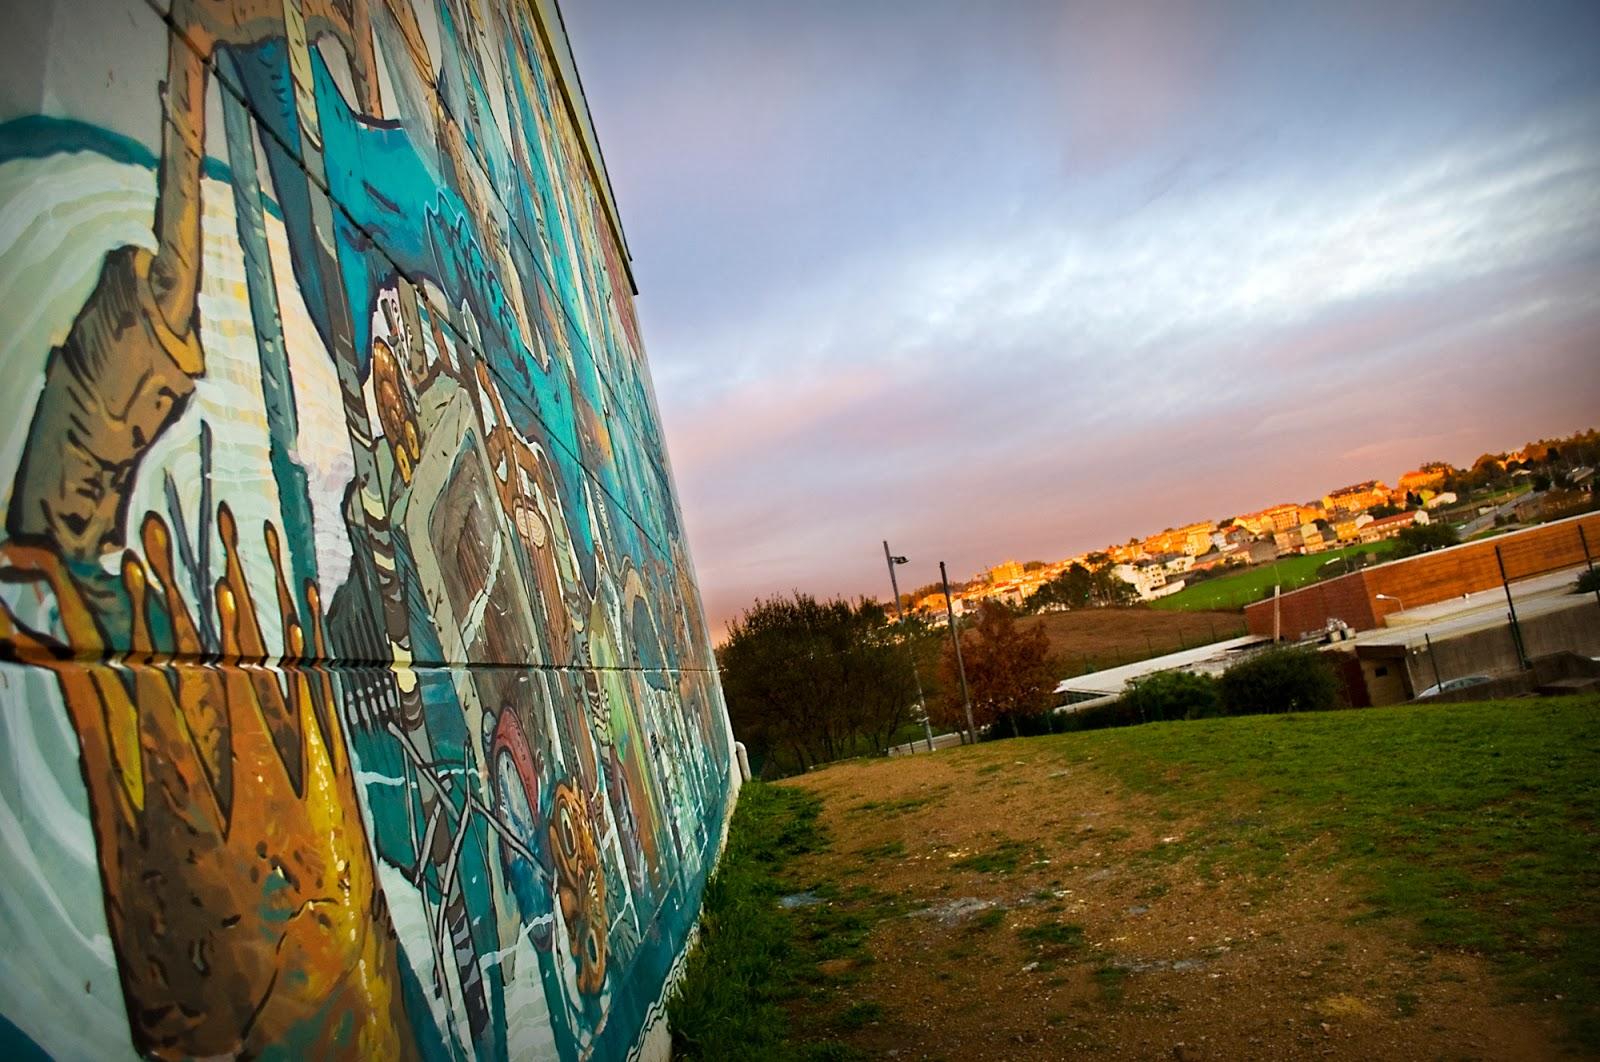 Riquiño-new-mural-at-desordes-creativas-2013-12